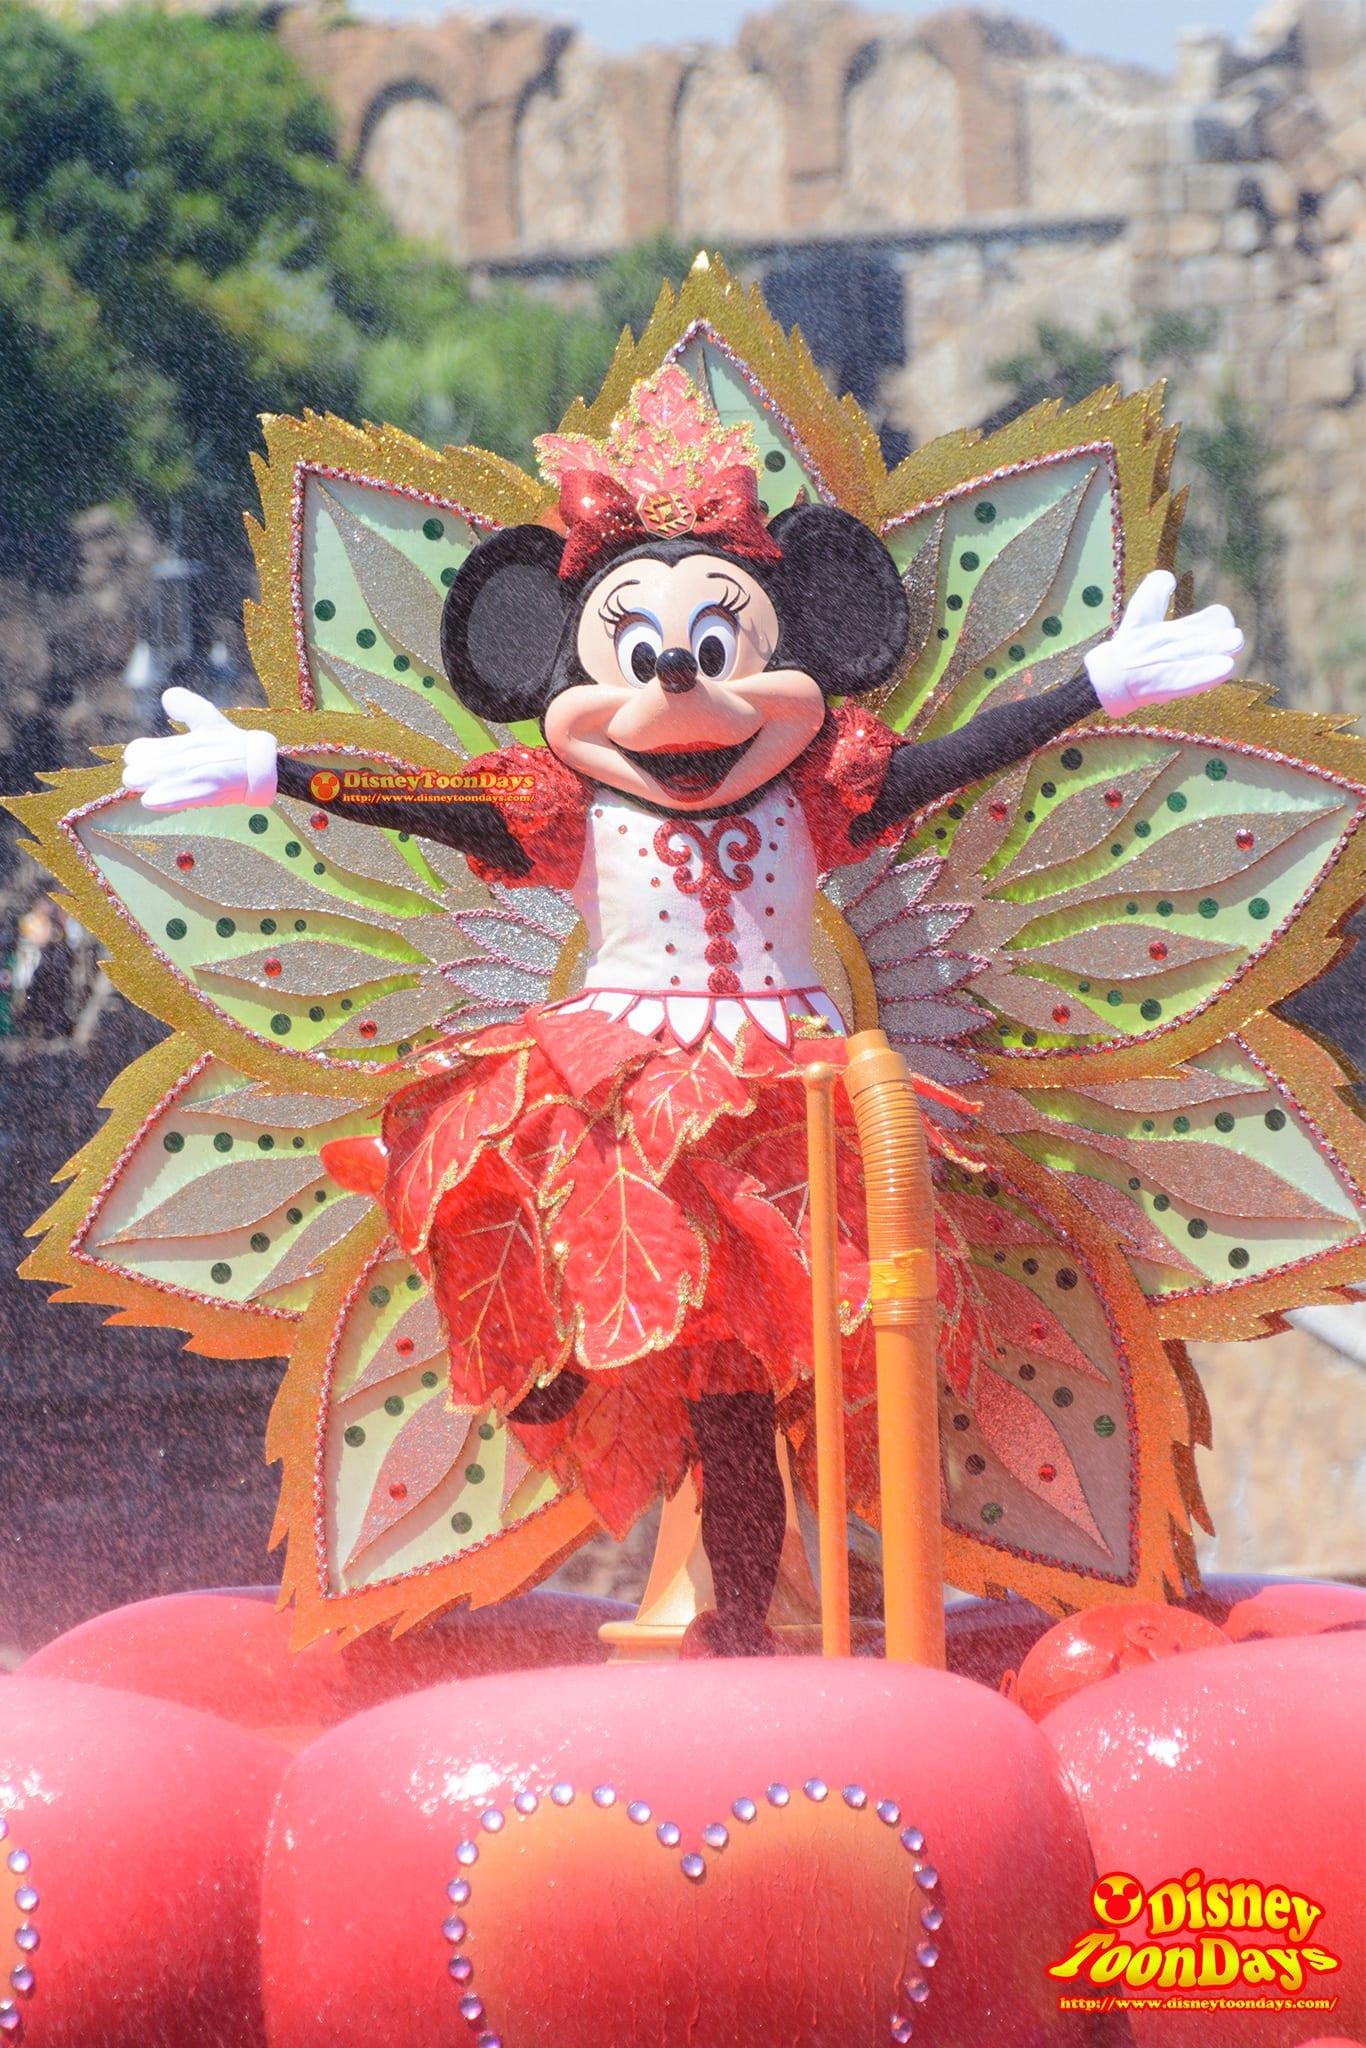 TDS 2015 メディテレーニアンハーバー ディズニー・サマーフェスティバル ミニーのトロピカルスプラッシュ ミニーマウス